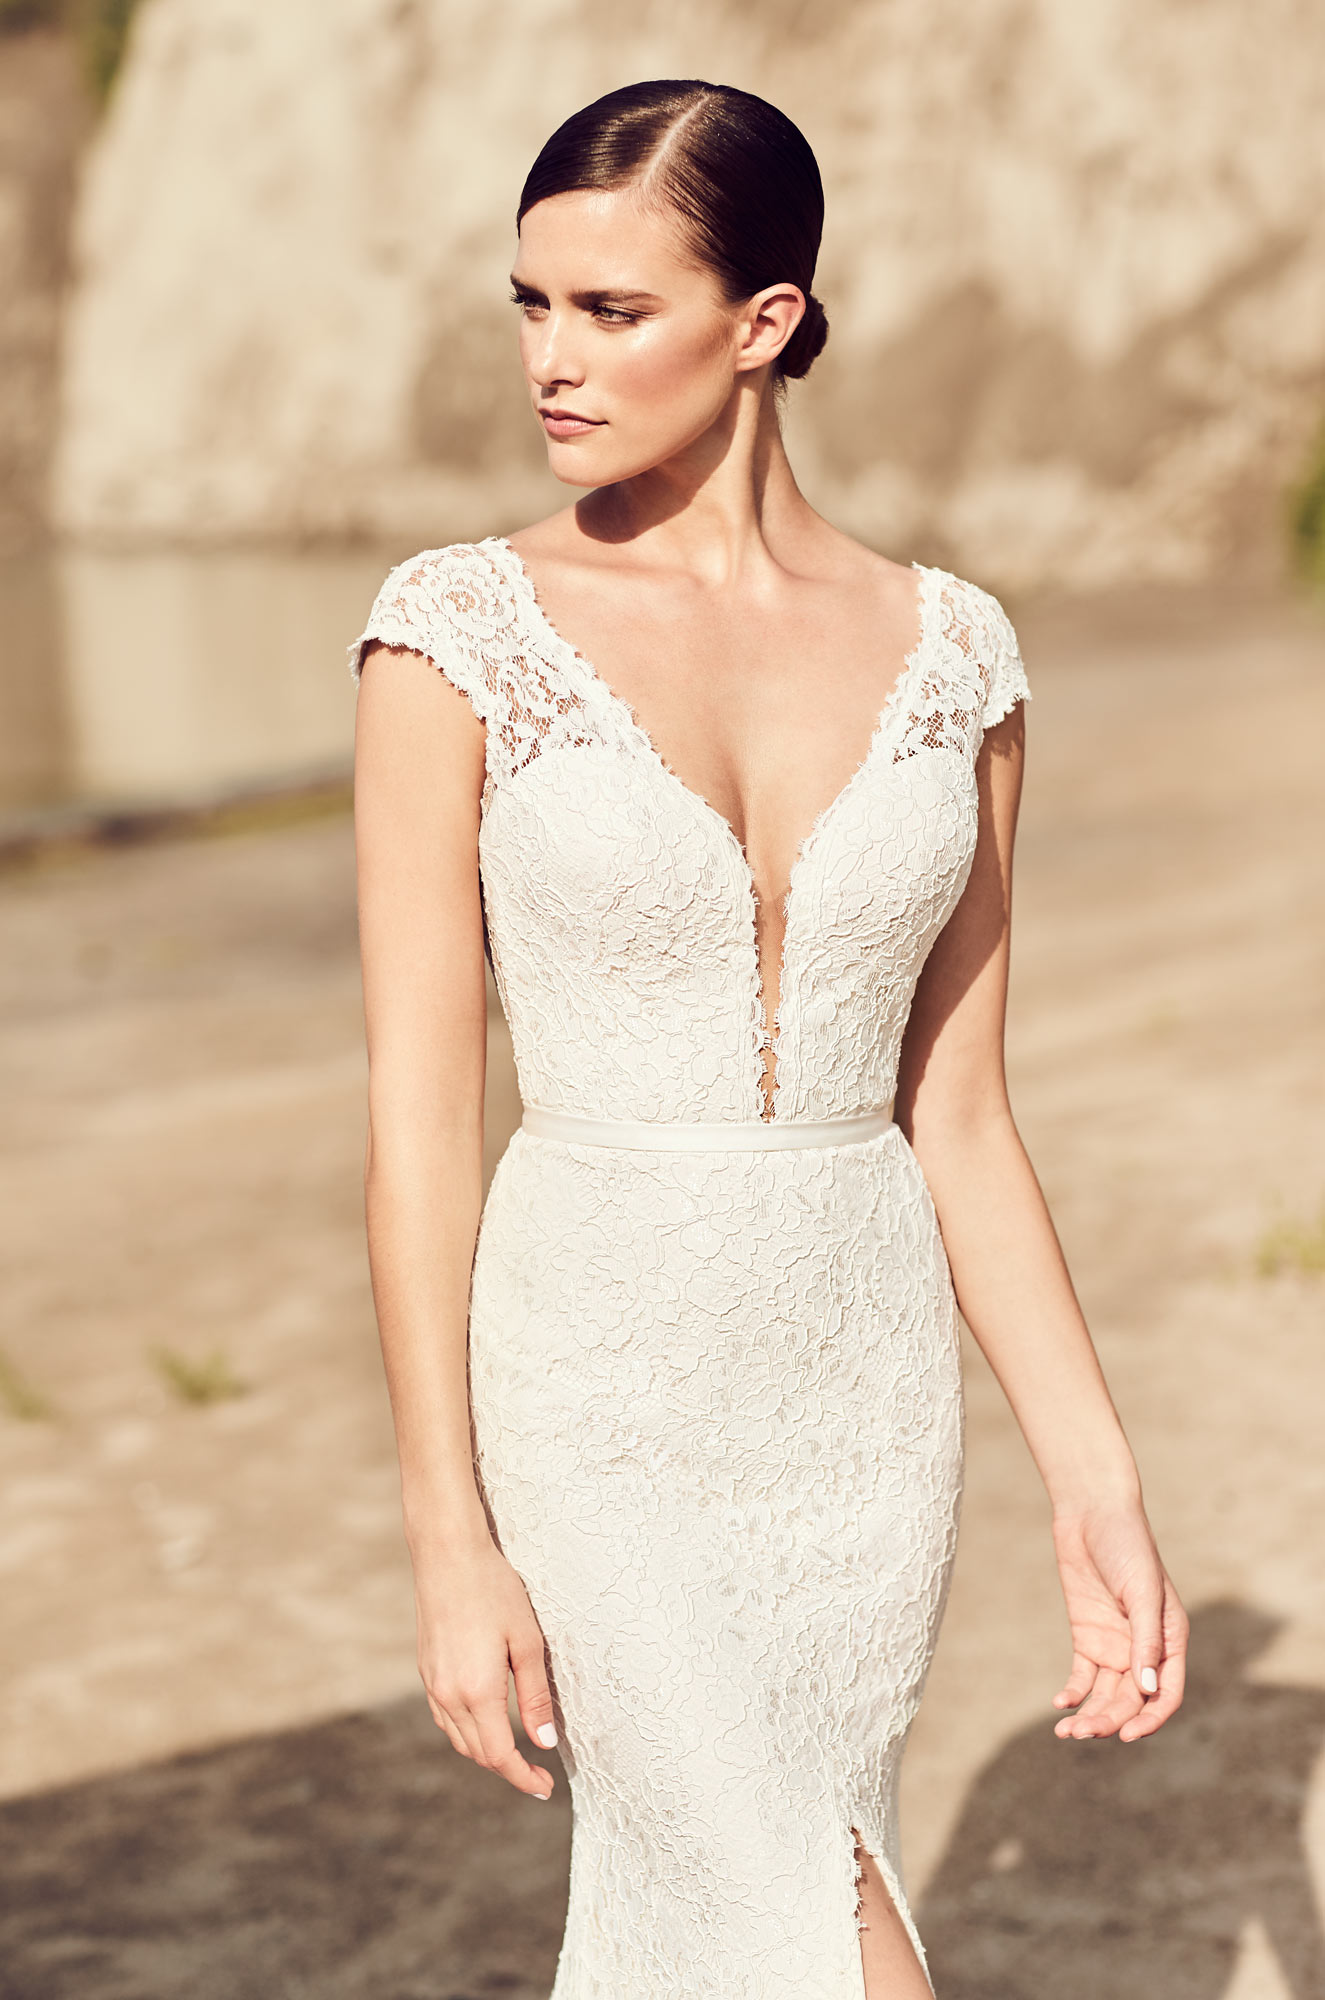 wedding dress nordstrom wedding dresses nordstrom wedding dress wedding gowns nordstrom